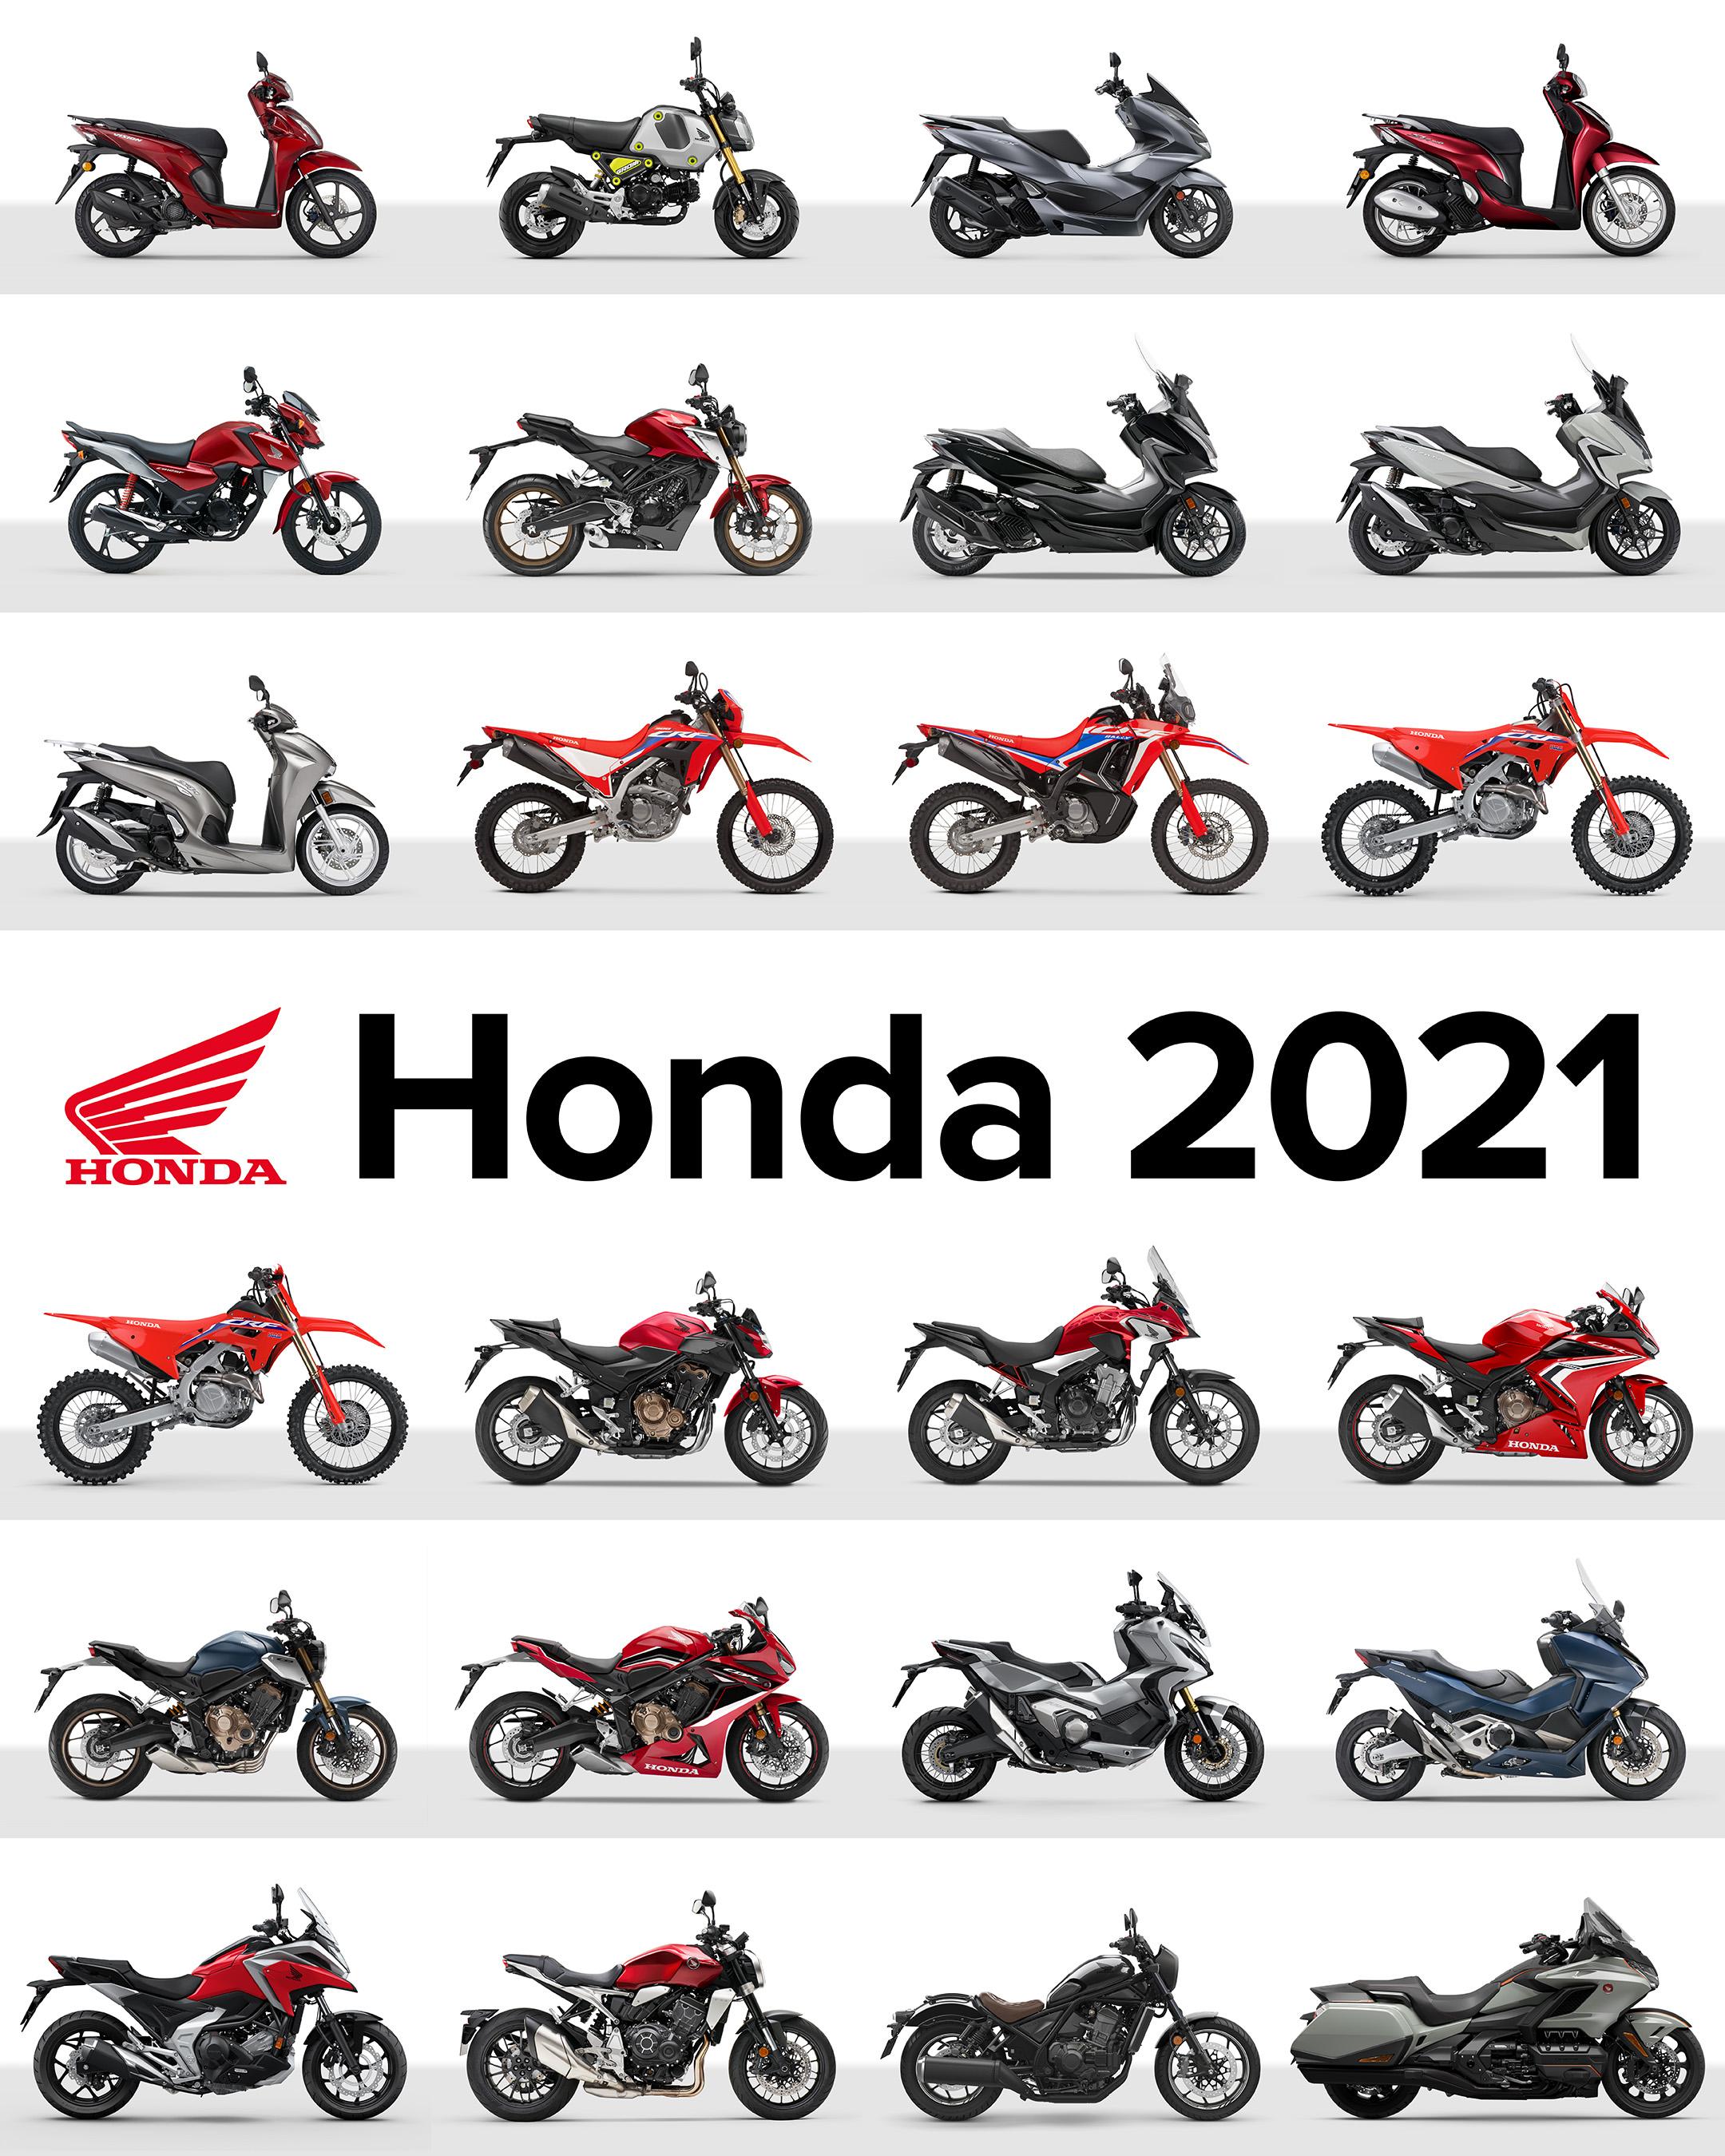 Honda Moto: Νέος Τιμοκατάλογος και Αναβαθμισμένη Γκάμα Μοτοσυκλετών 2021